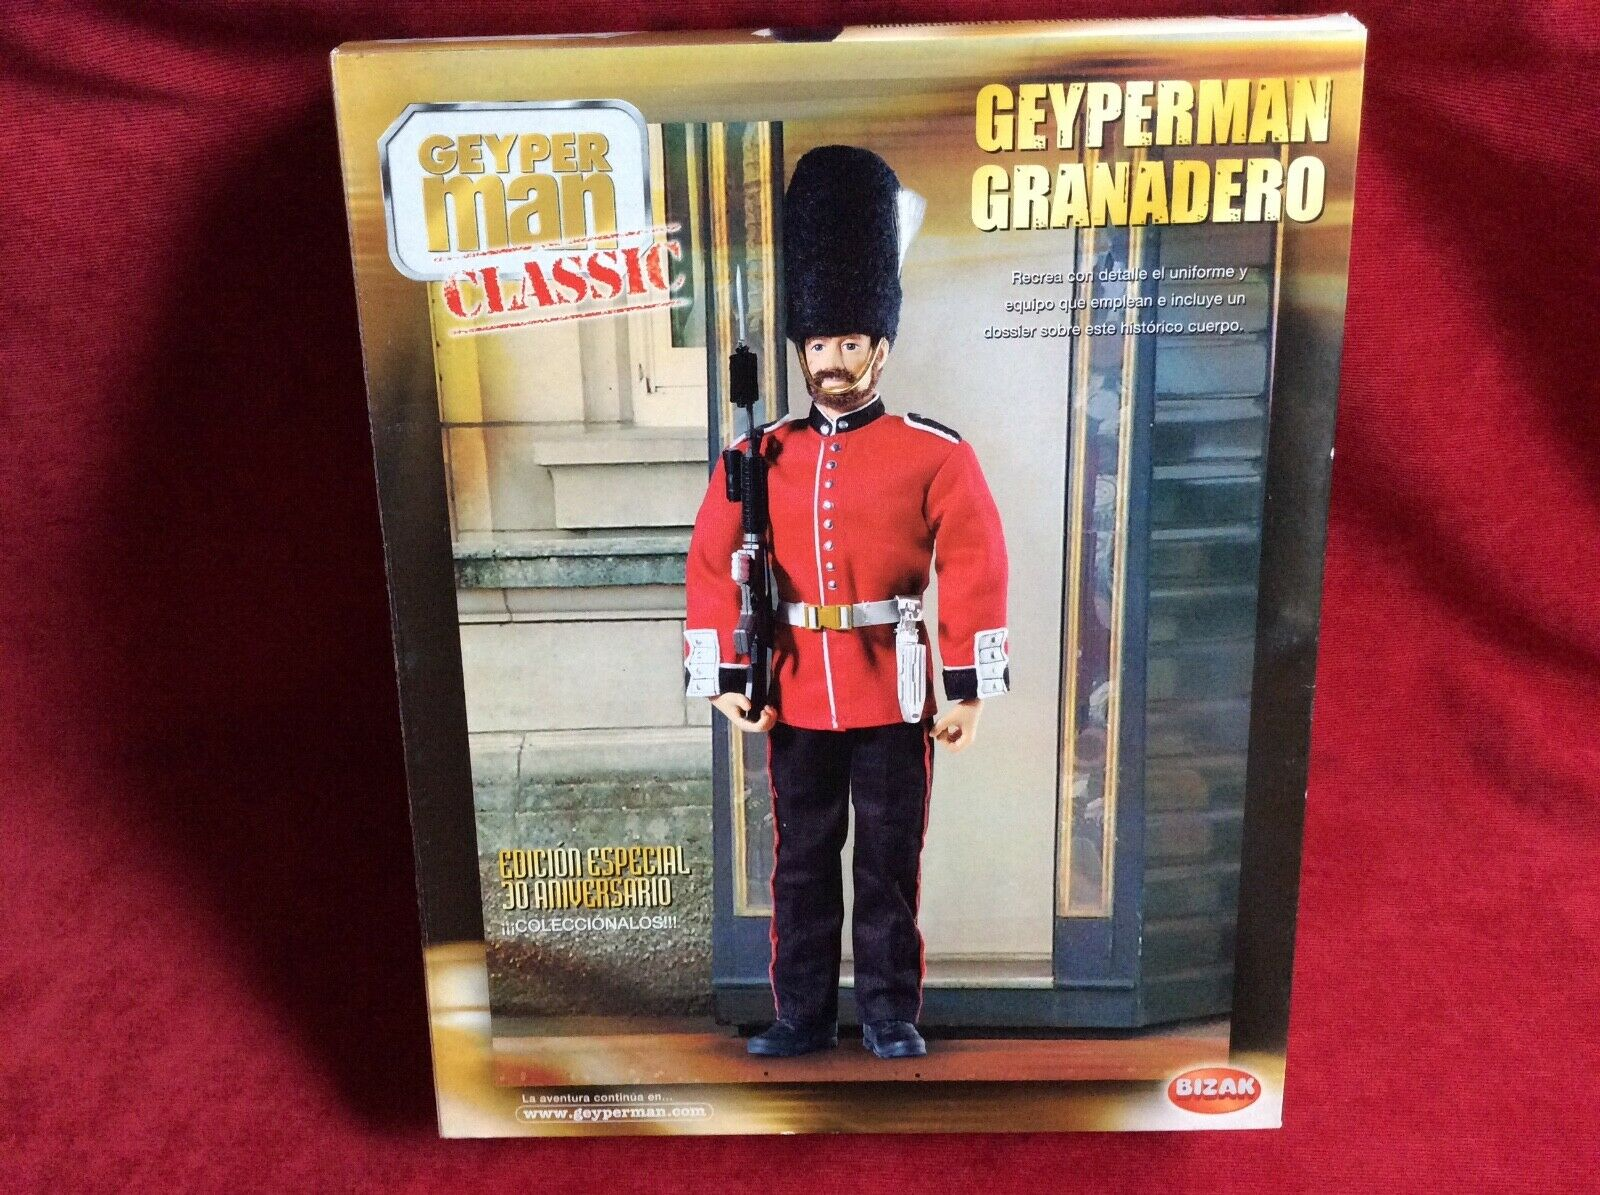 GEYPERMAN granadero ingles Geyper man